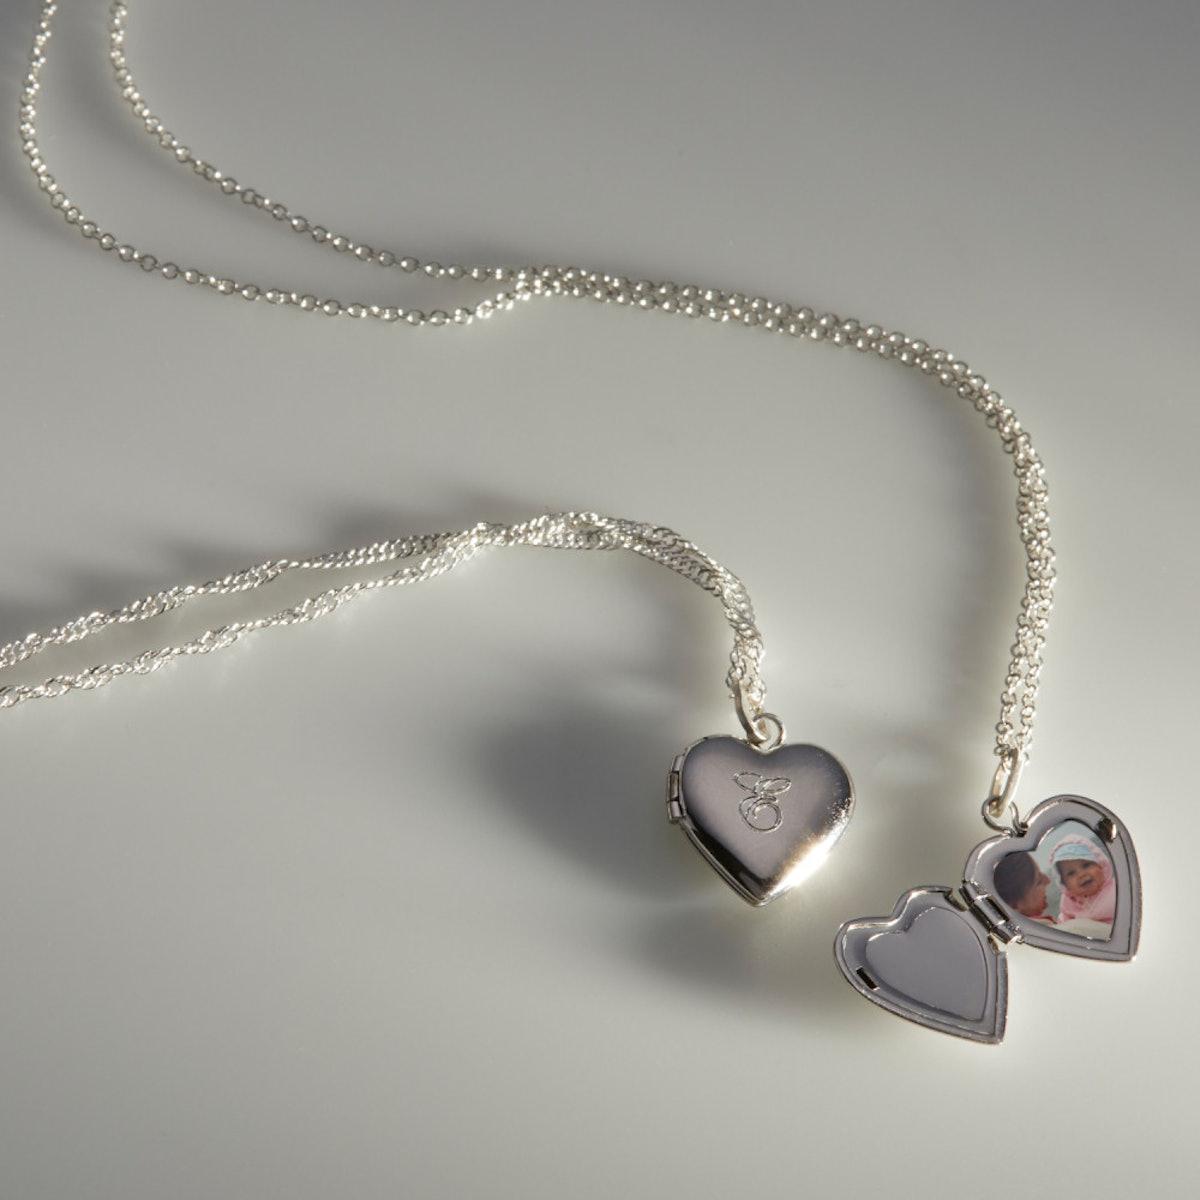 DOLLHOUSE HEART LOCKET